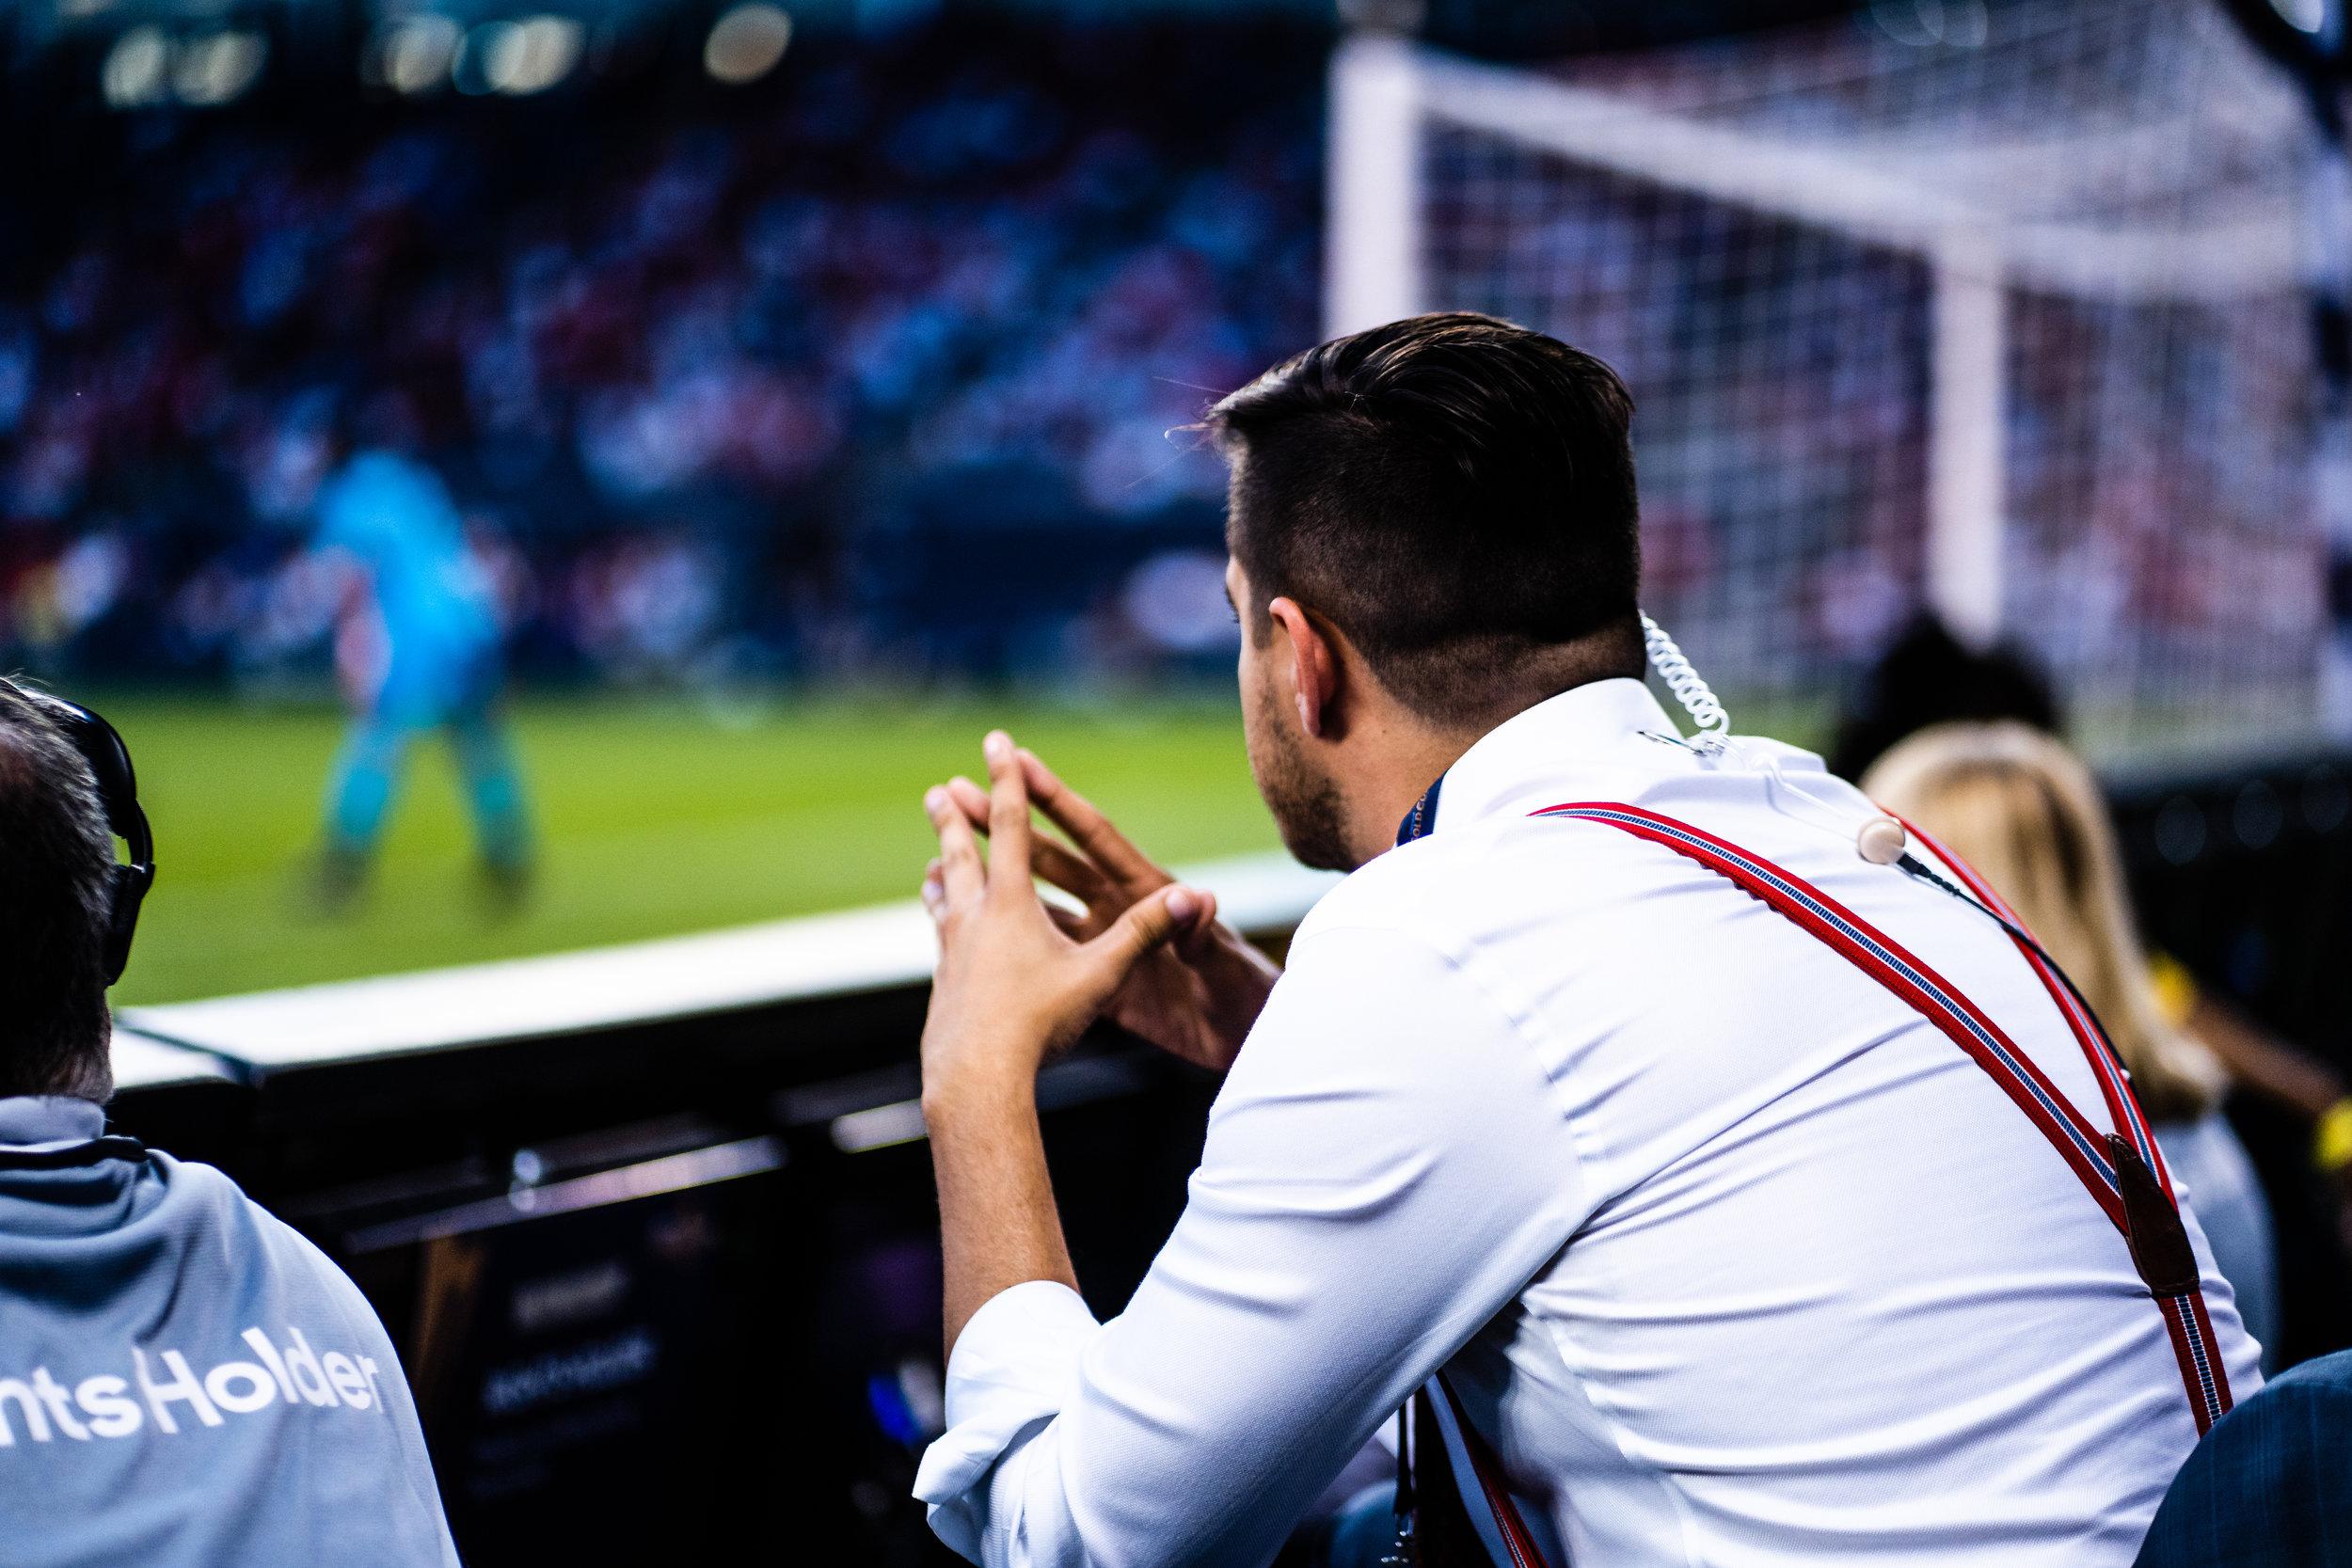 CONCACAF Gold Cup - June 26, 2019 - CJC05803.jpg